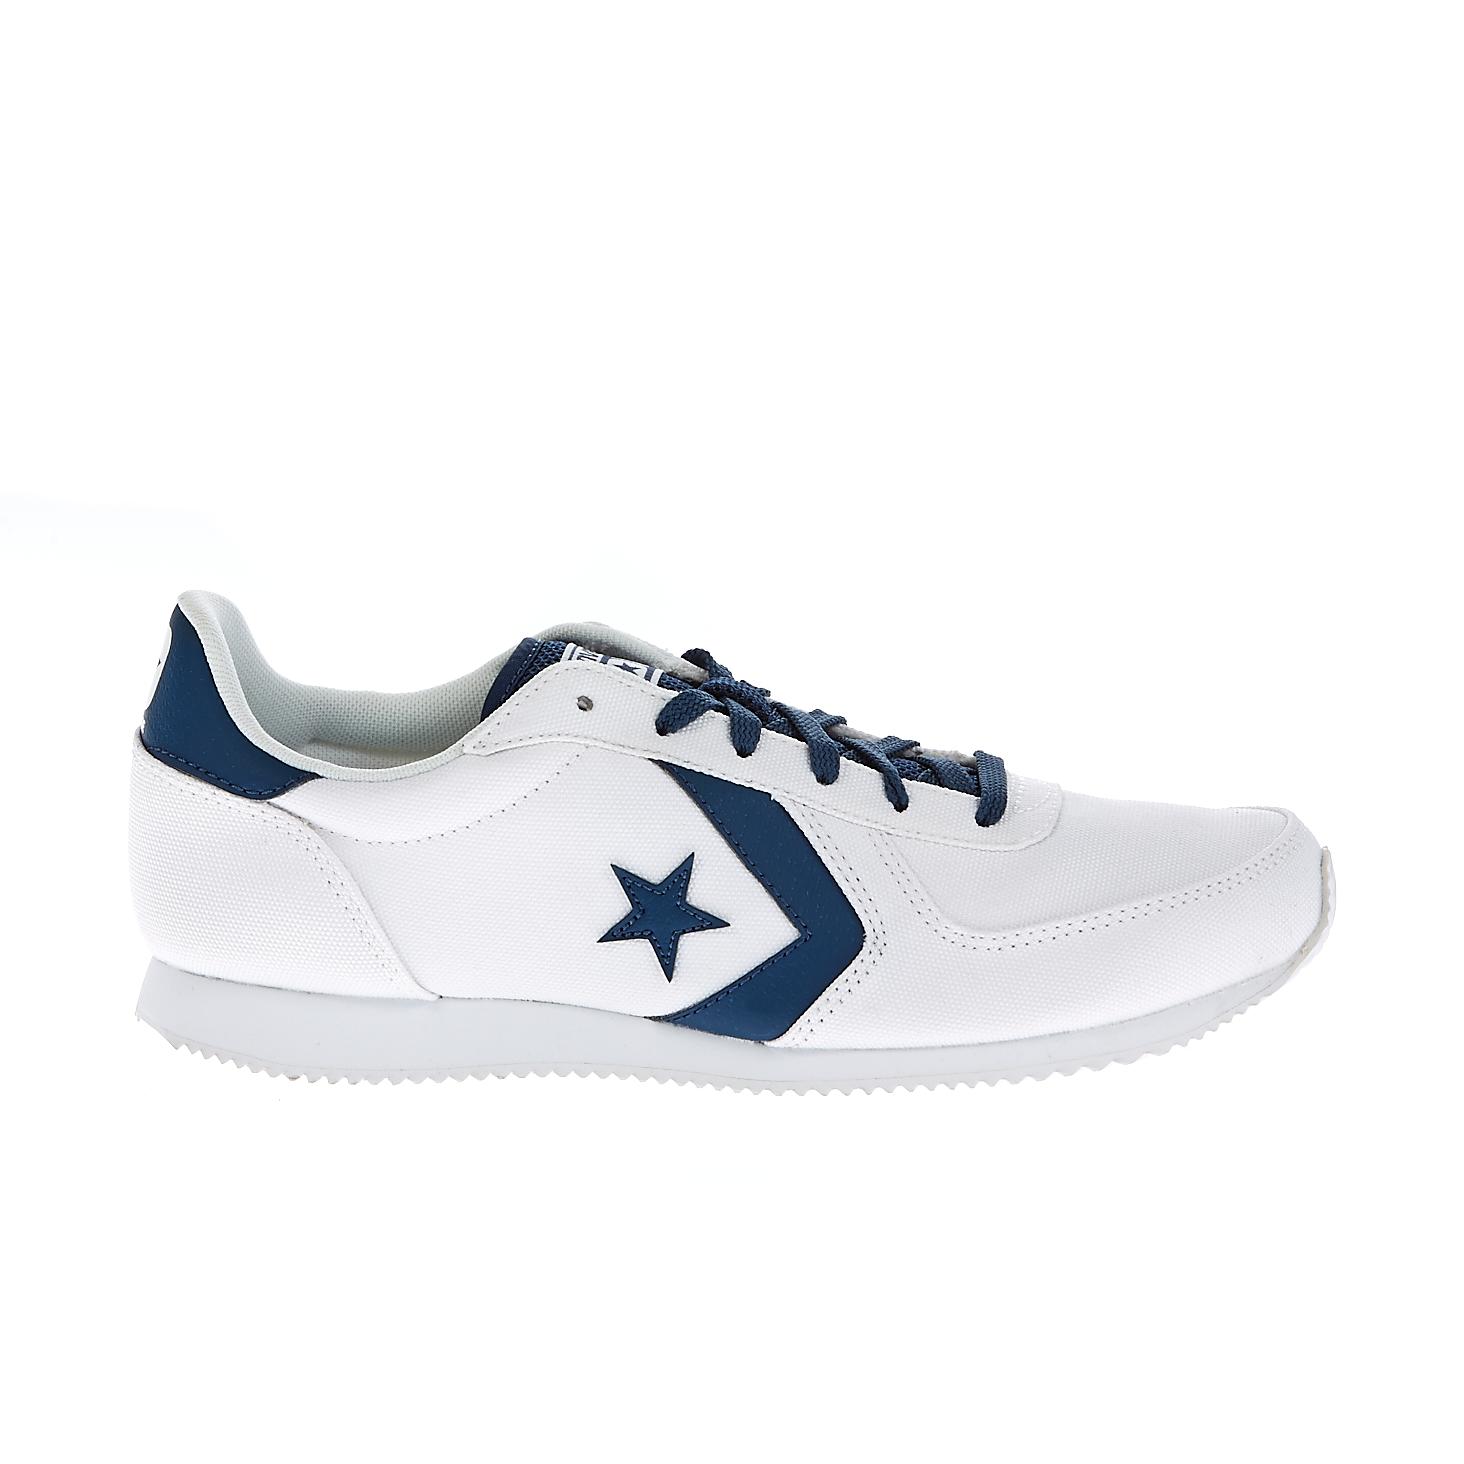 CONVERSE - Unisex παπούτσια Arizona Racer λευκά γυναικεία παπούτσια sneakers